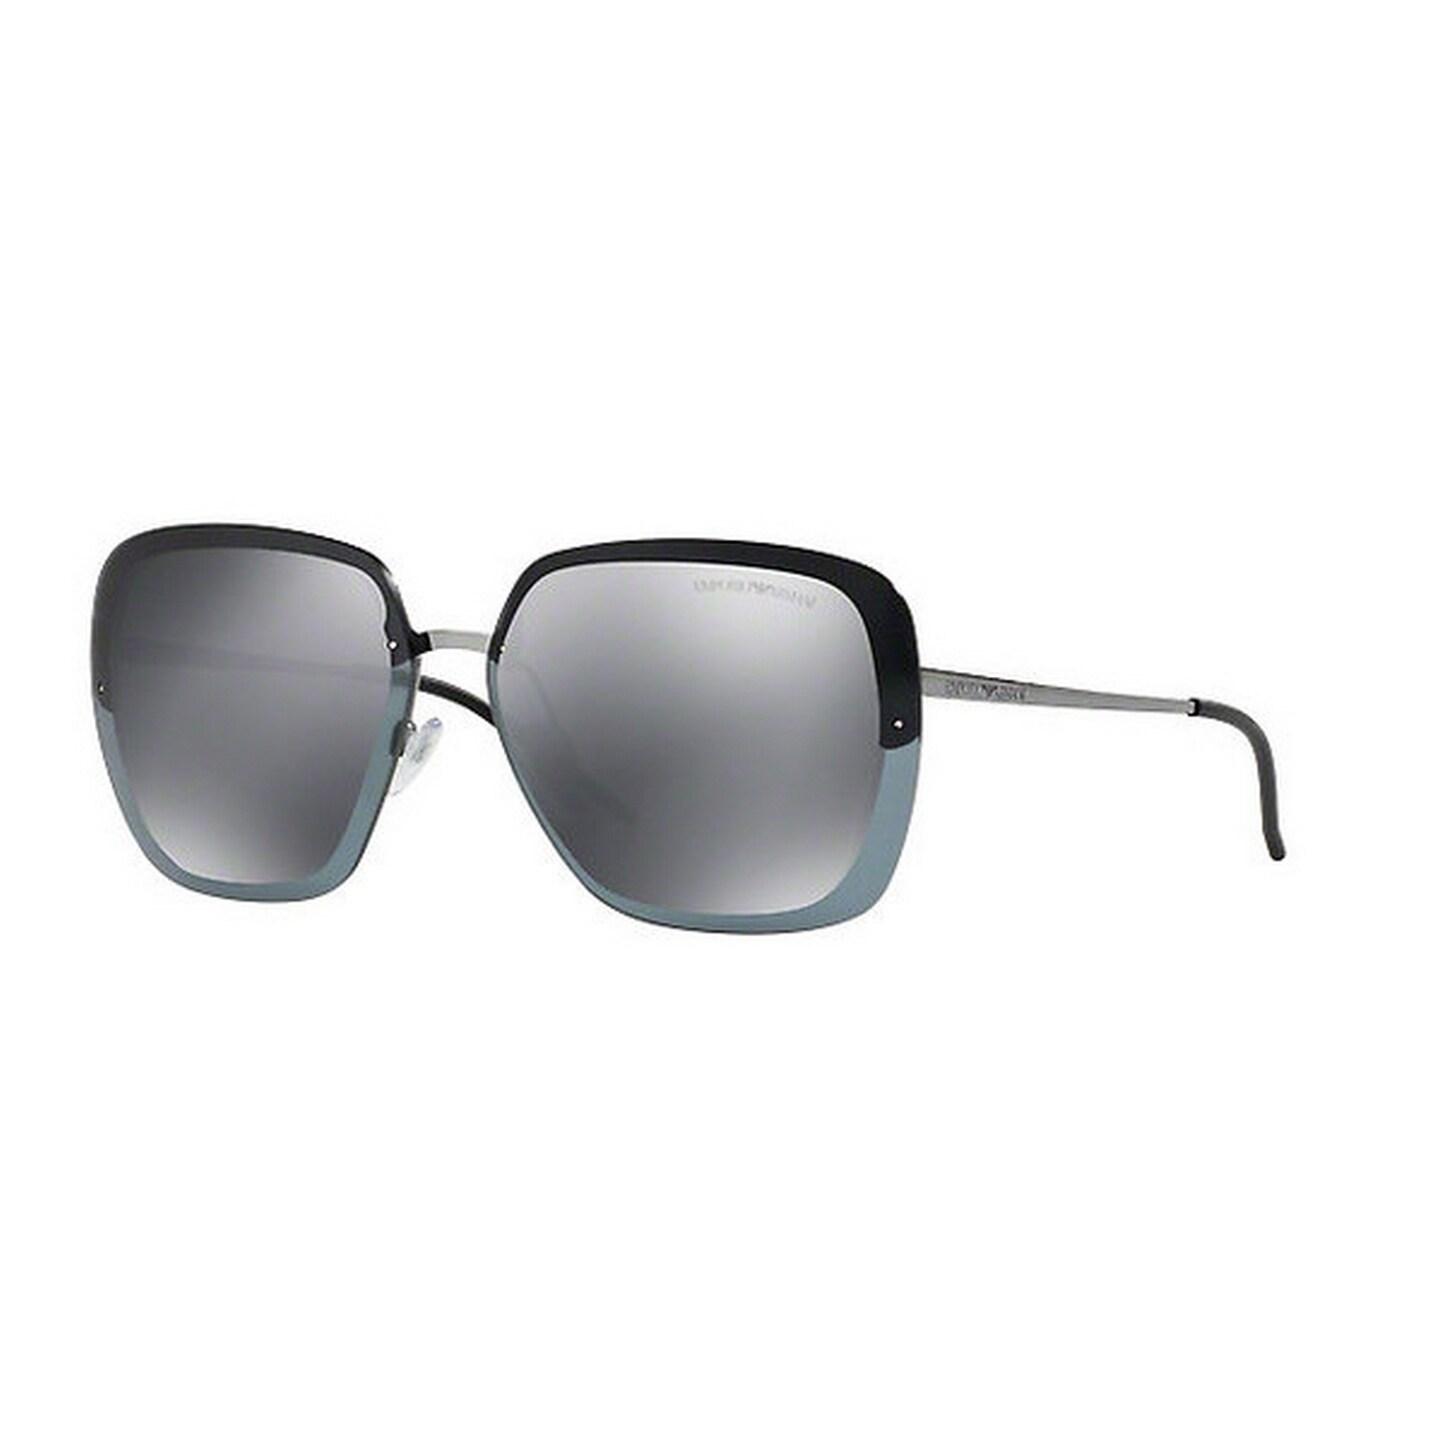 25cda030ea Emporio Armani Women s EA2045 30106G 62 Square Metal Plastic Gunmetal Grey  Sunglasses